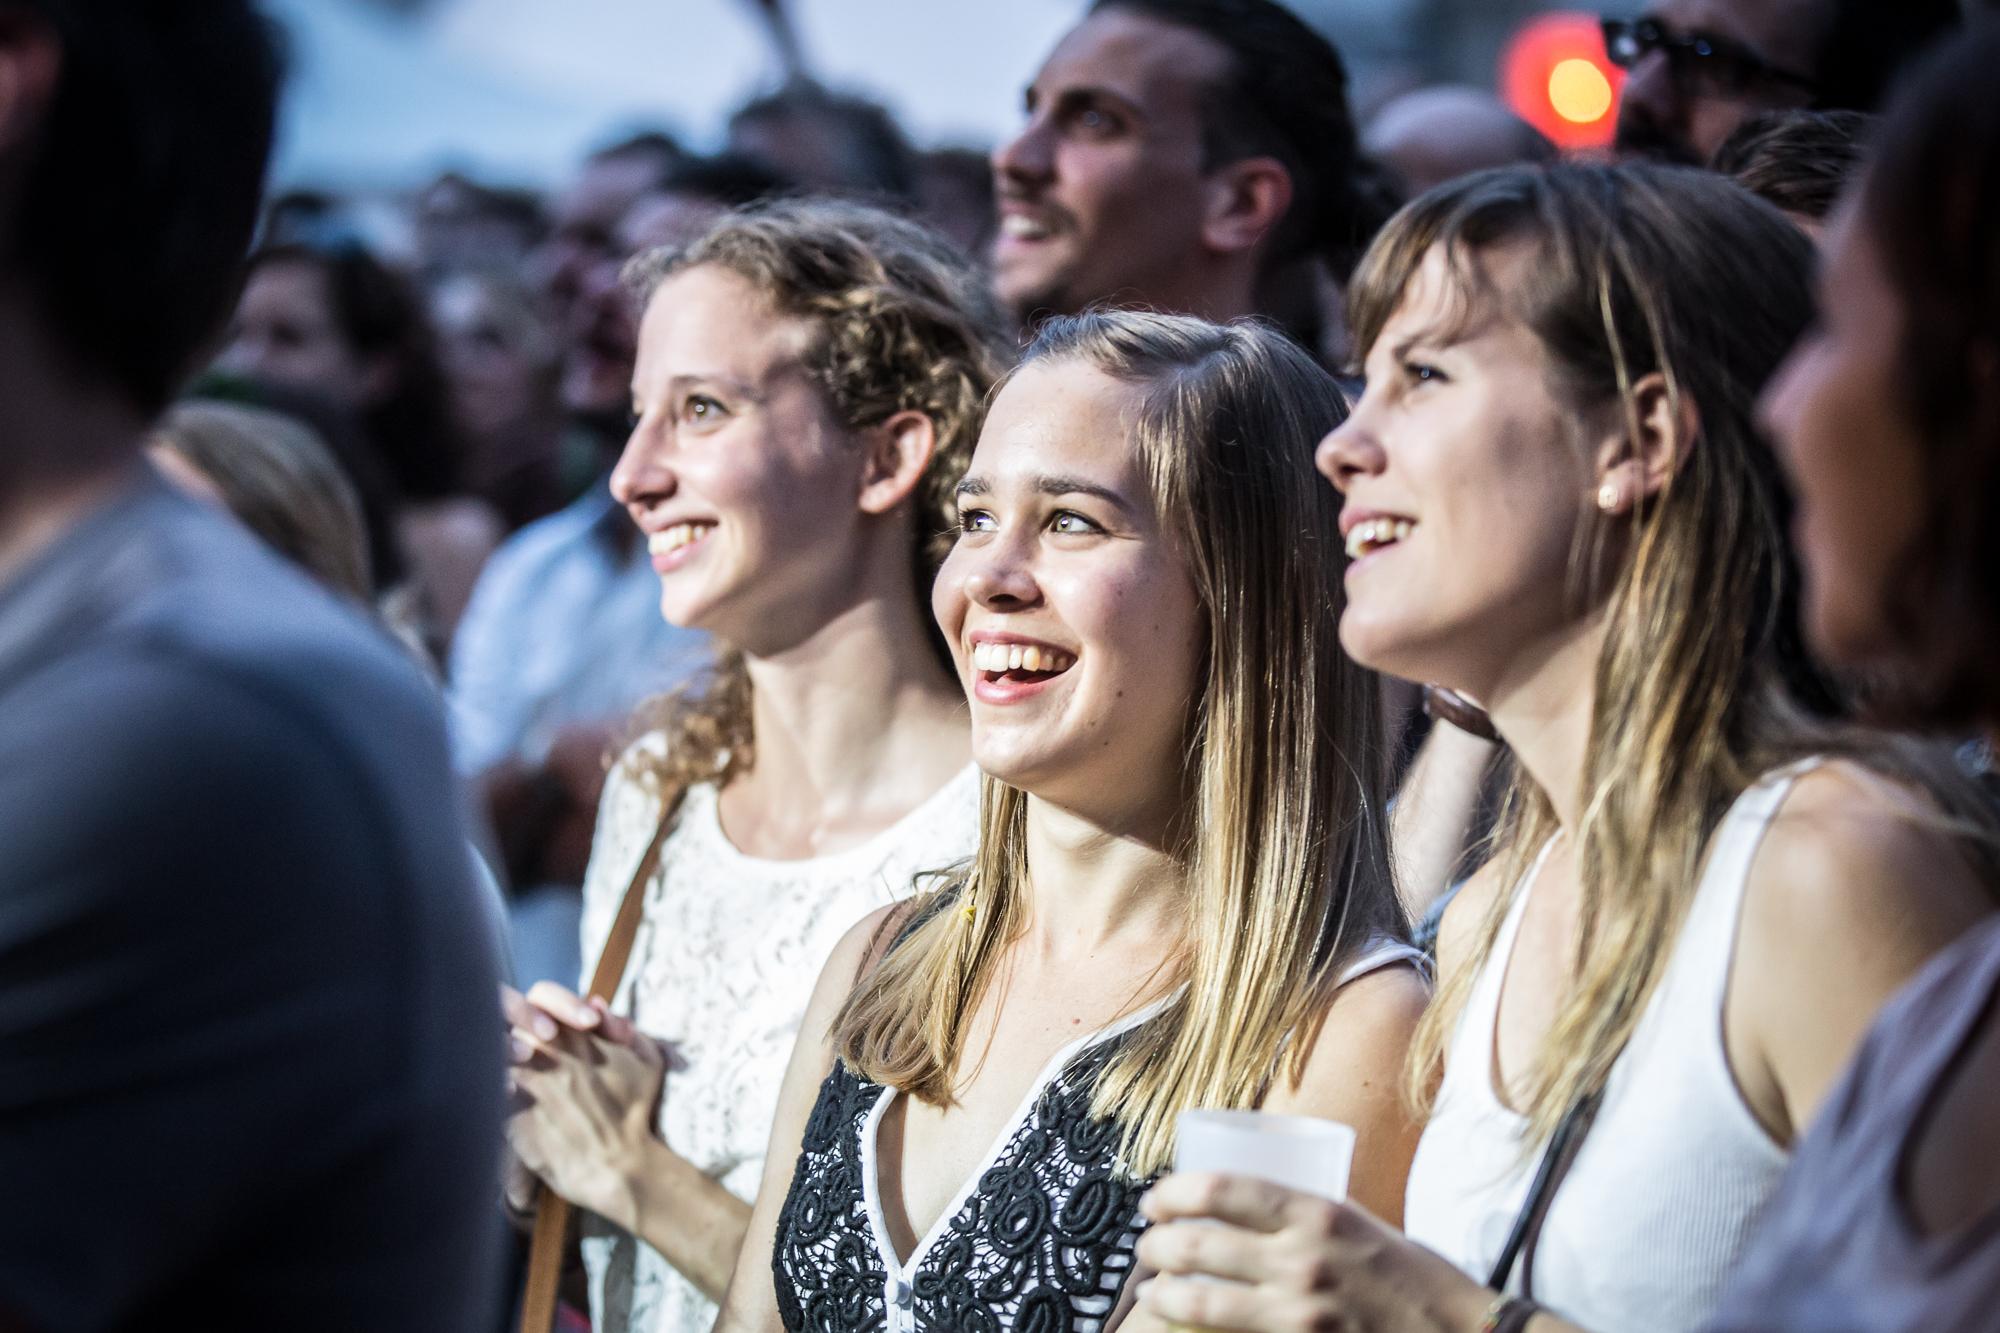 Les Georges Festival 2015, Fribourg, 18.07.2015